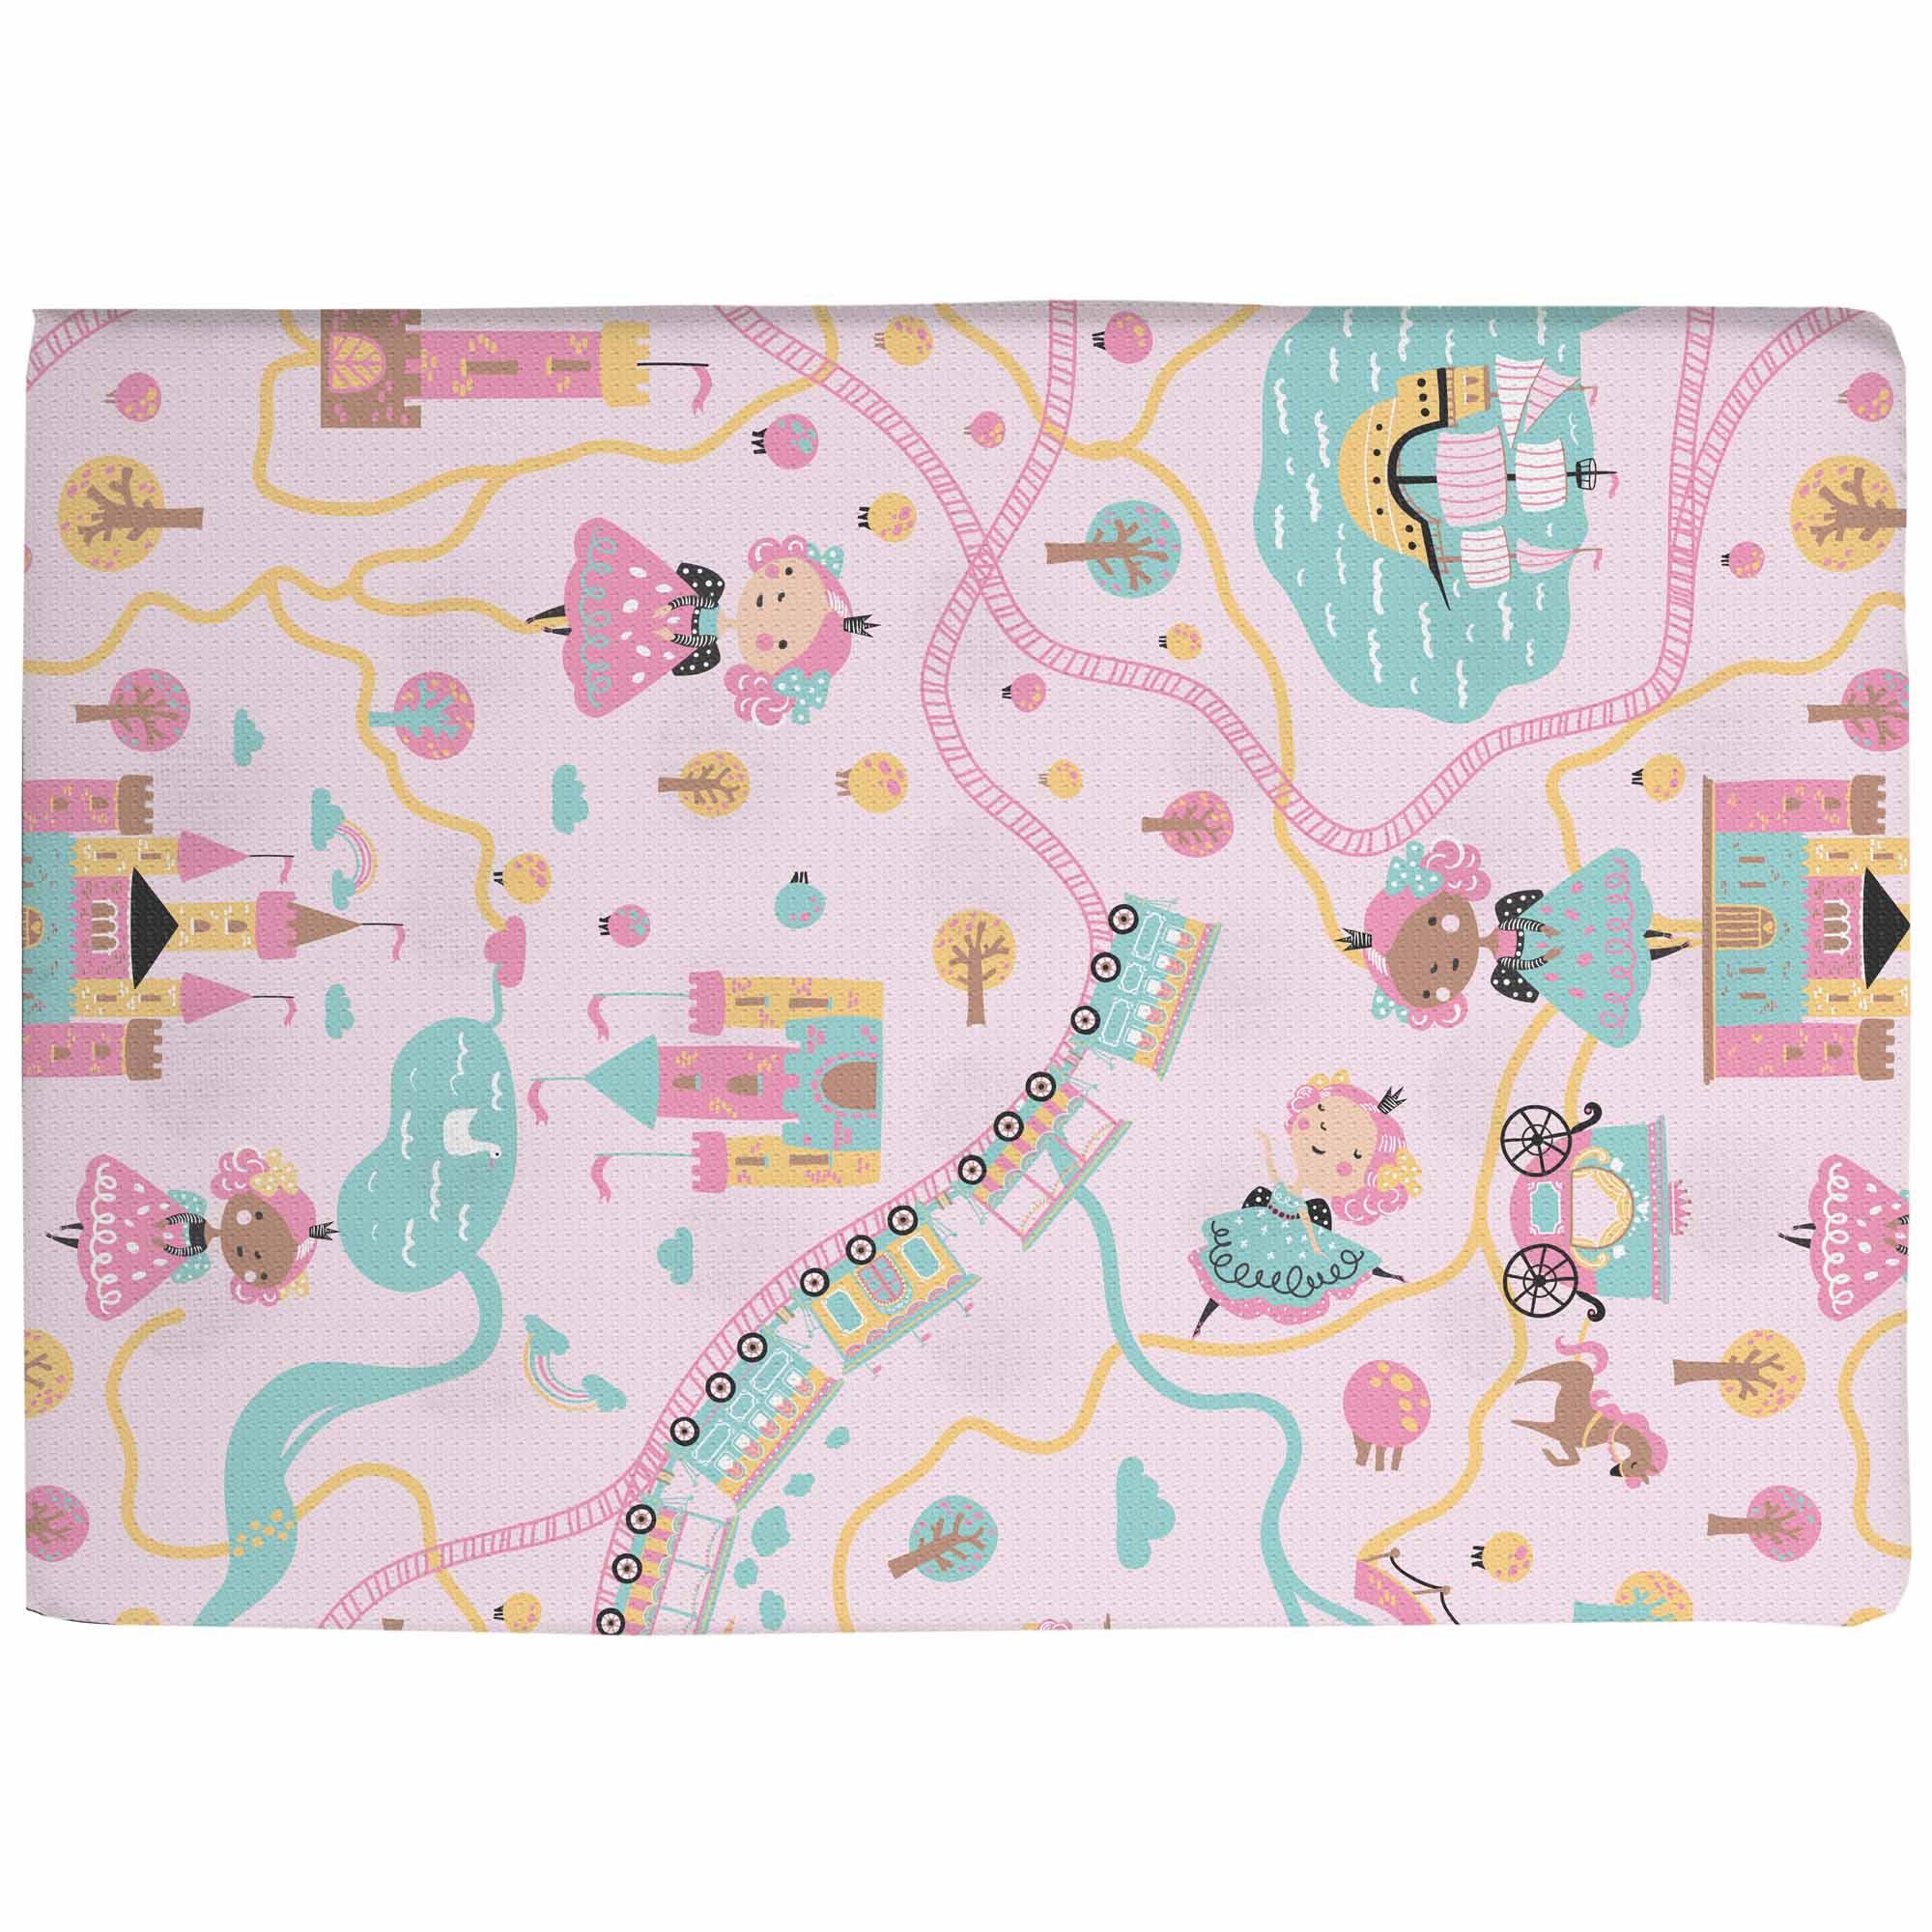 Travesseiro Antissufocante Estampado - Incomfral - Bambi - Princesa e Castelo